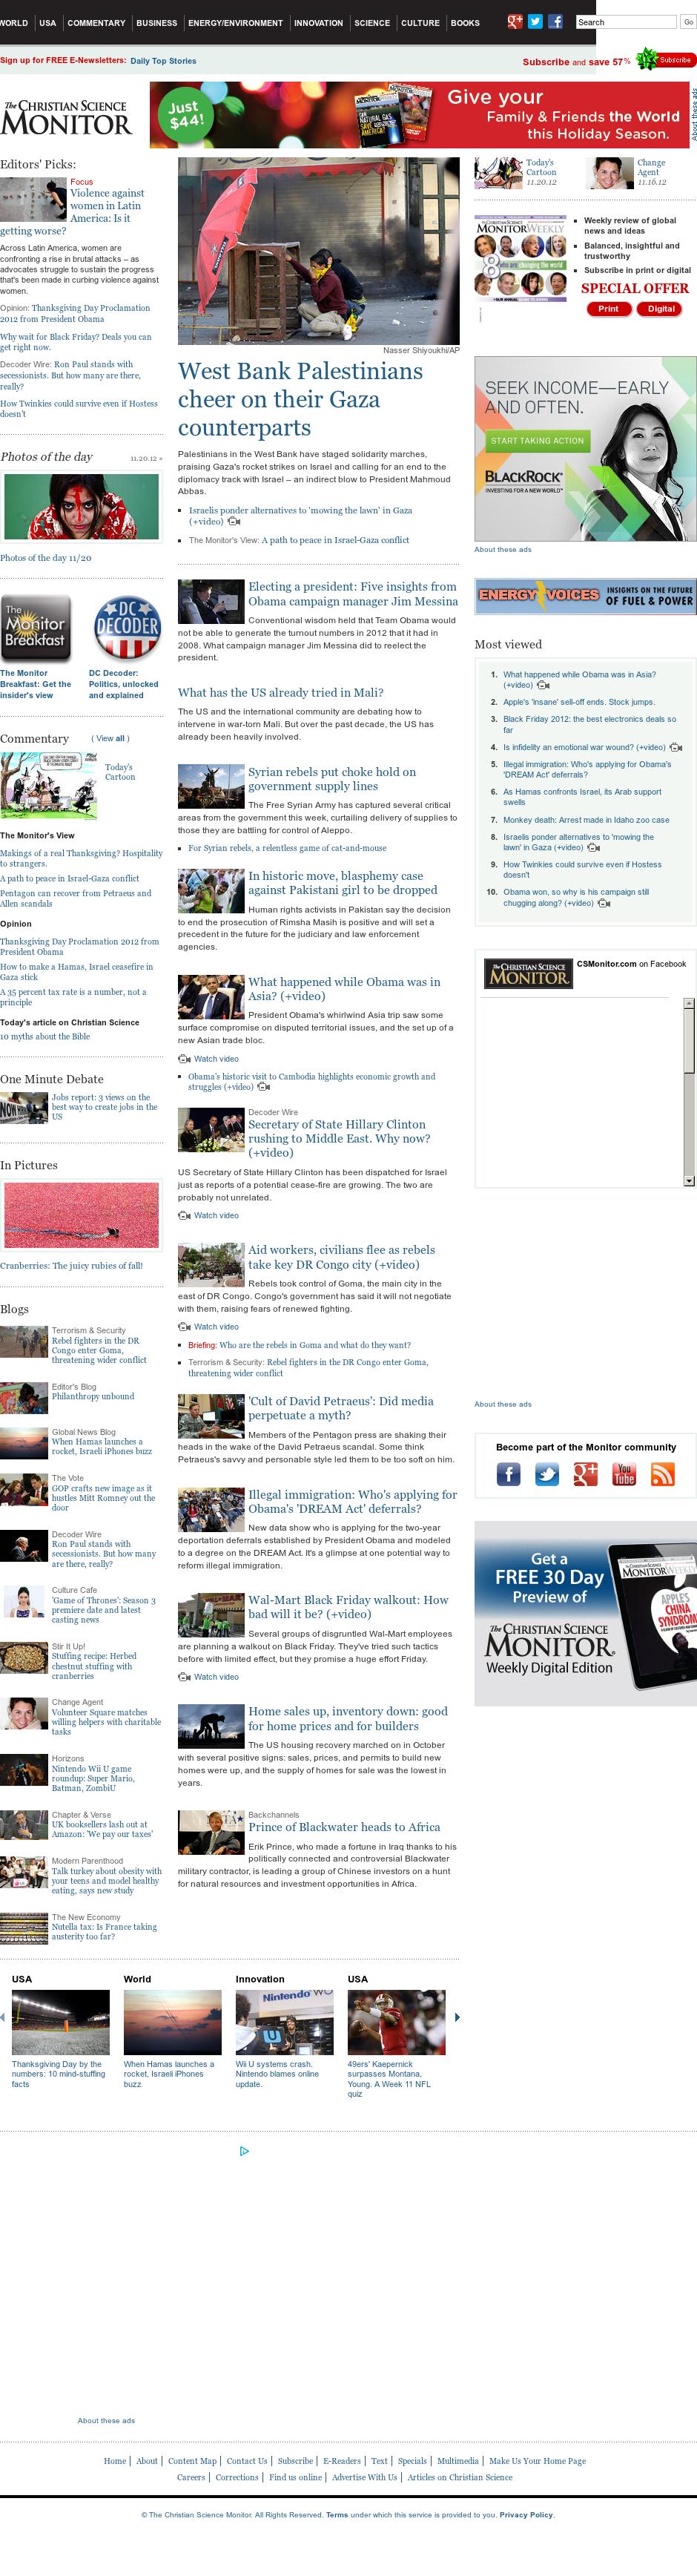 The Christian Science Monitor at Wednesday Nov. 21, 2012, 6:05 a.m. UTC